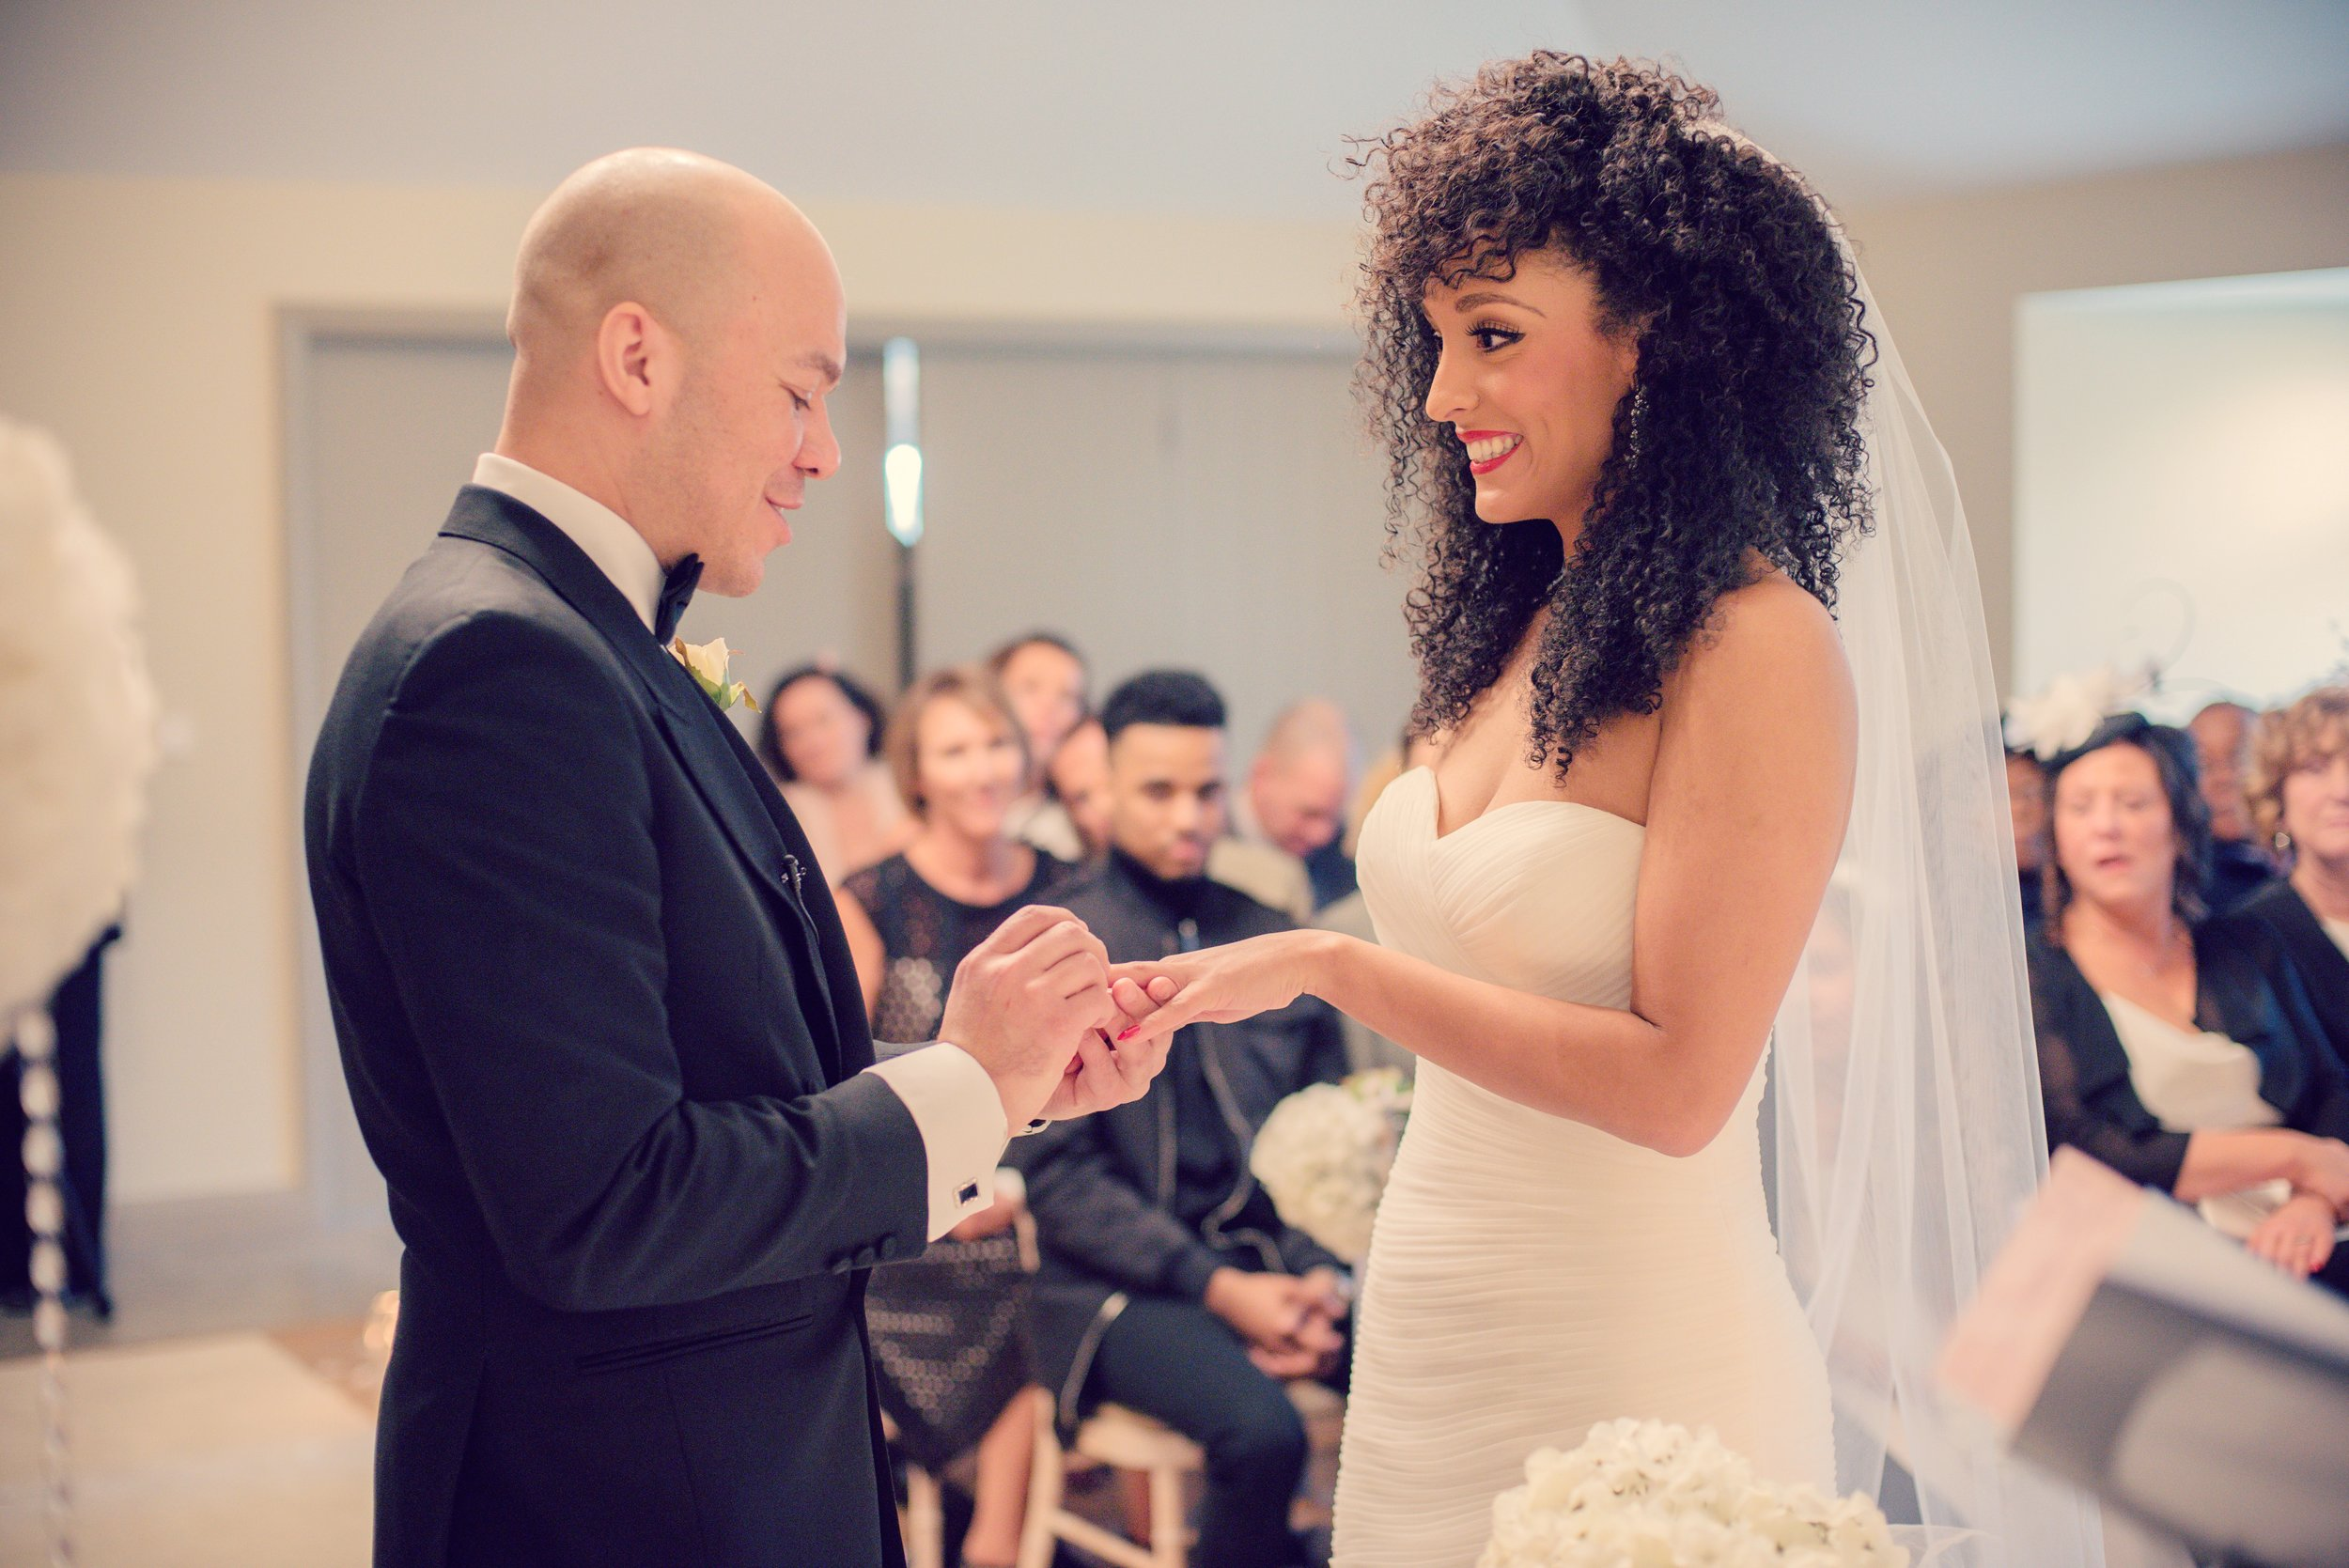 Danny Foster wife _ DANNY FOSTER WIFE _ Wedding _ Married _ DANNY FOSTER VICTORIA GODDARD 0.jpeg